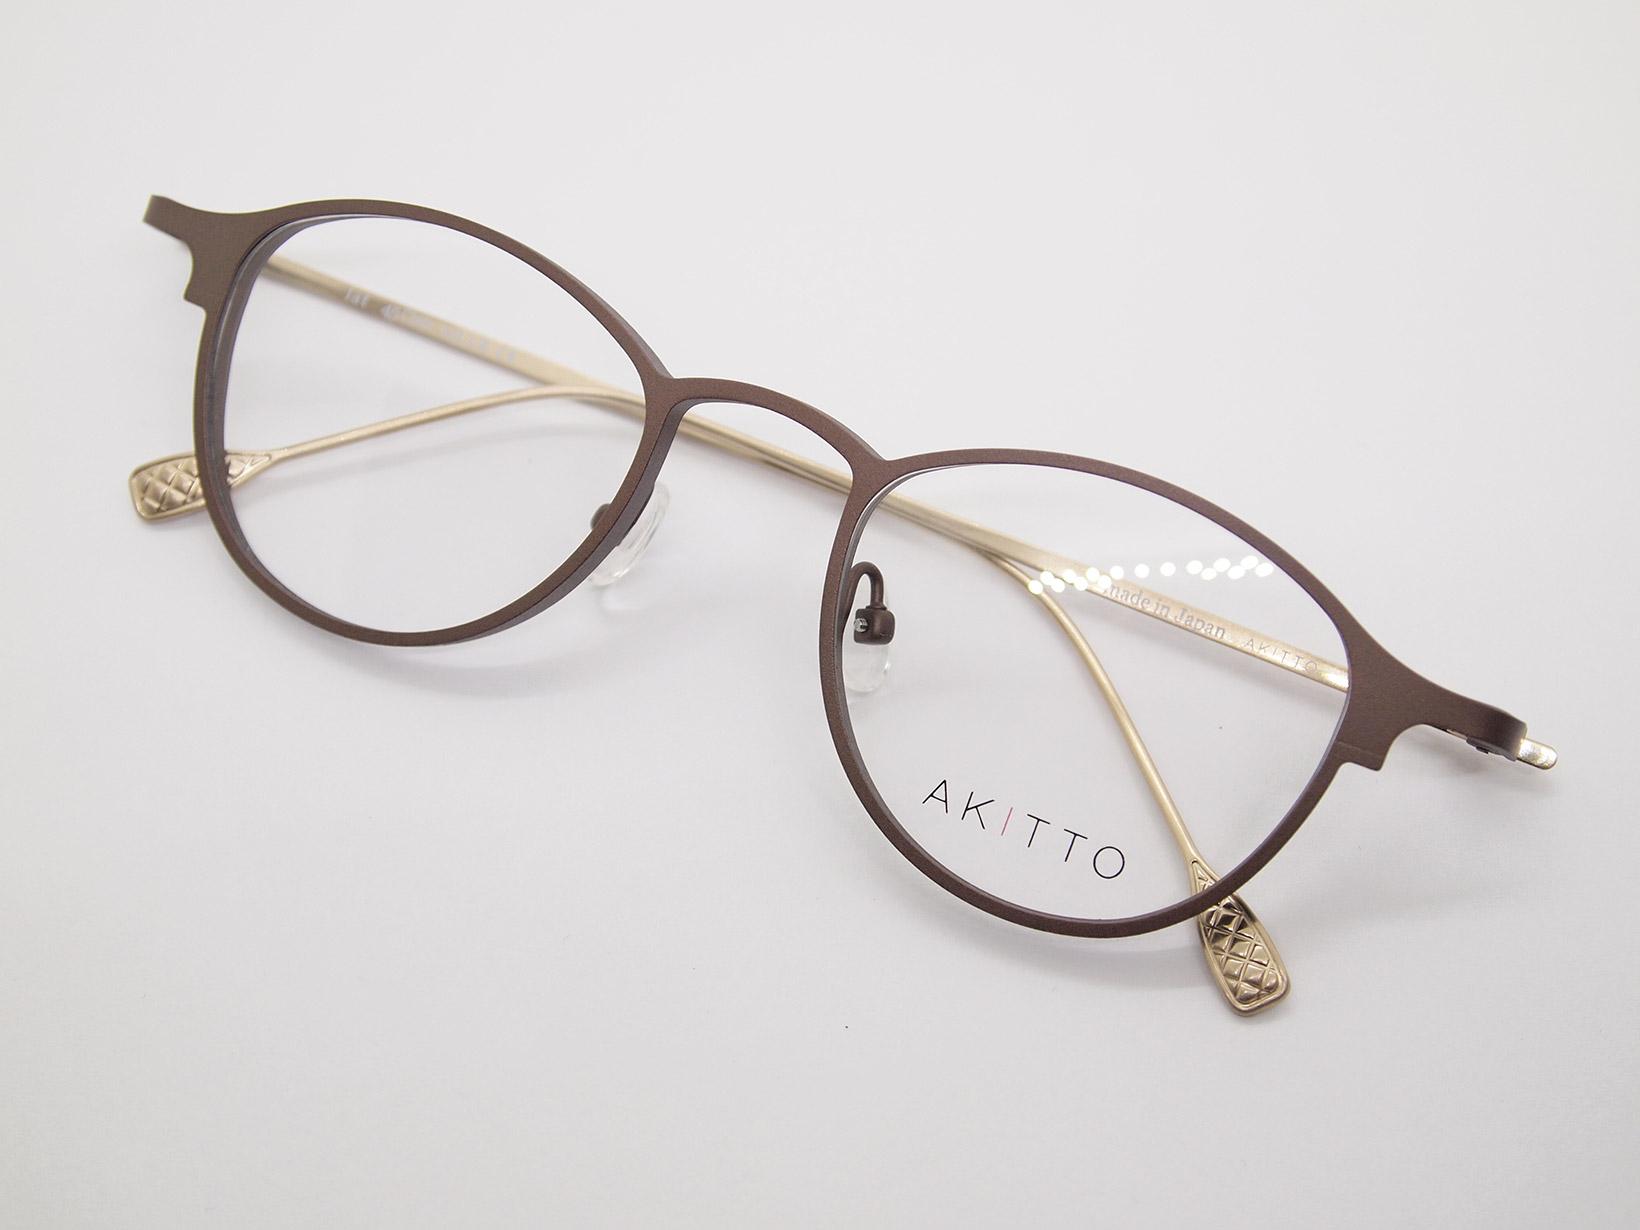 AKITTO 2021-4th lat color|LB size:45□20 material:titanium price:¥46,200-(税込み)